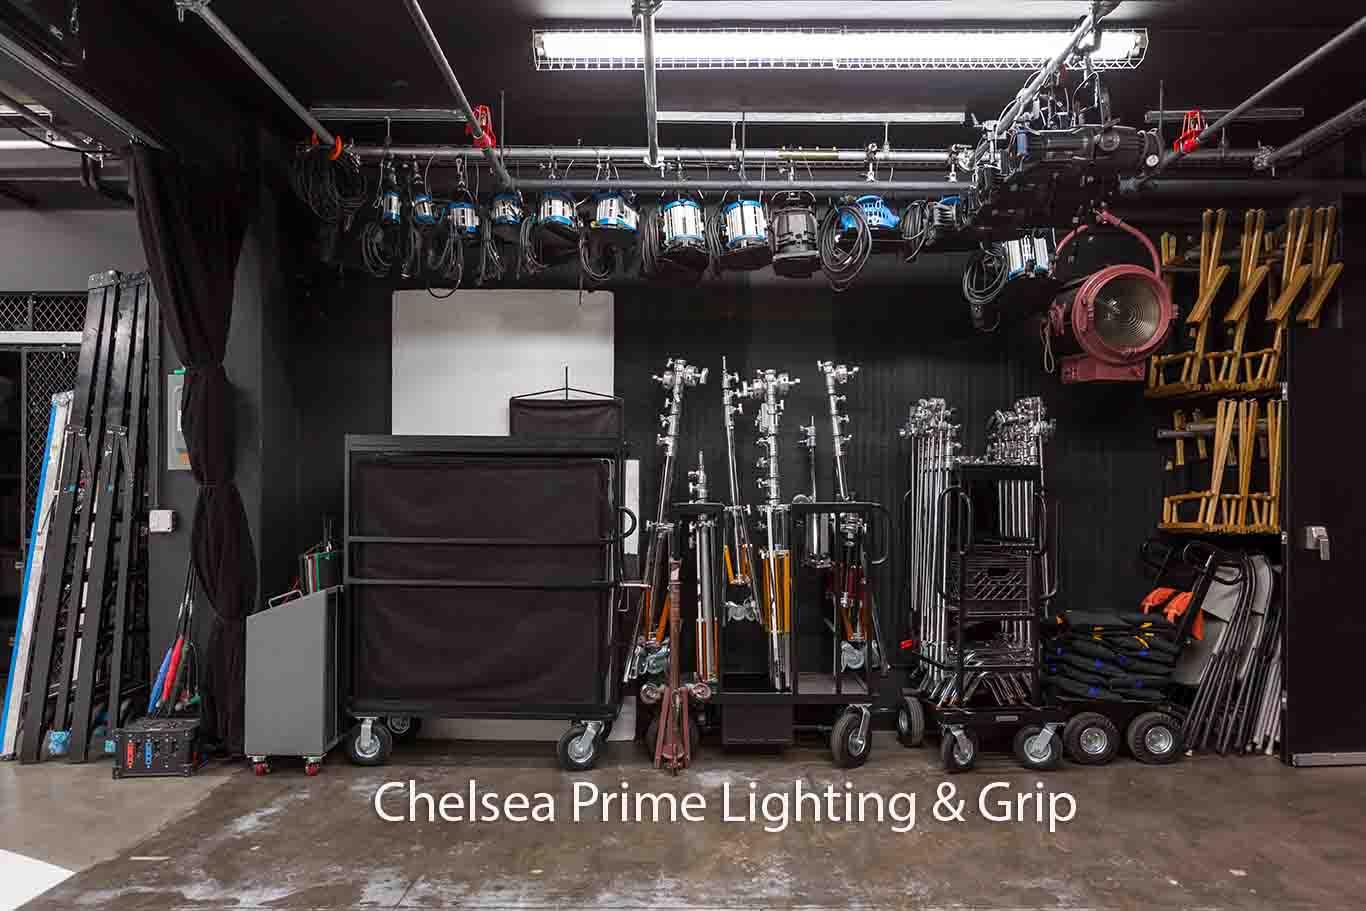 Chelsea Prime Lighting & Grip